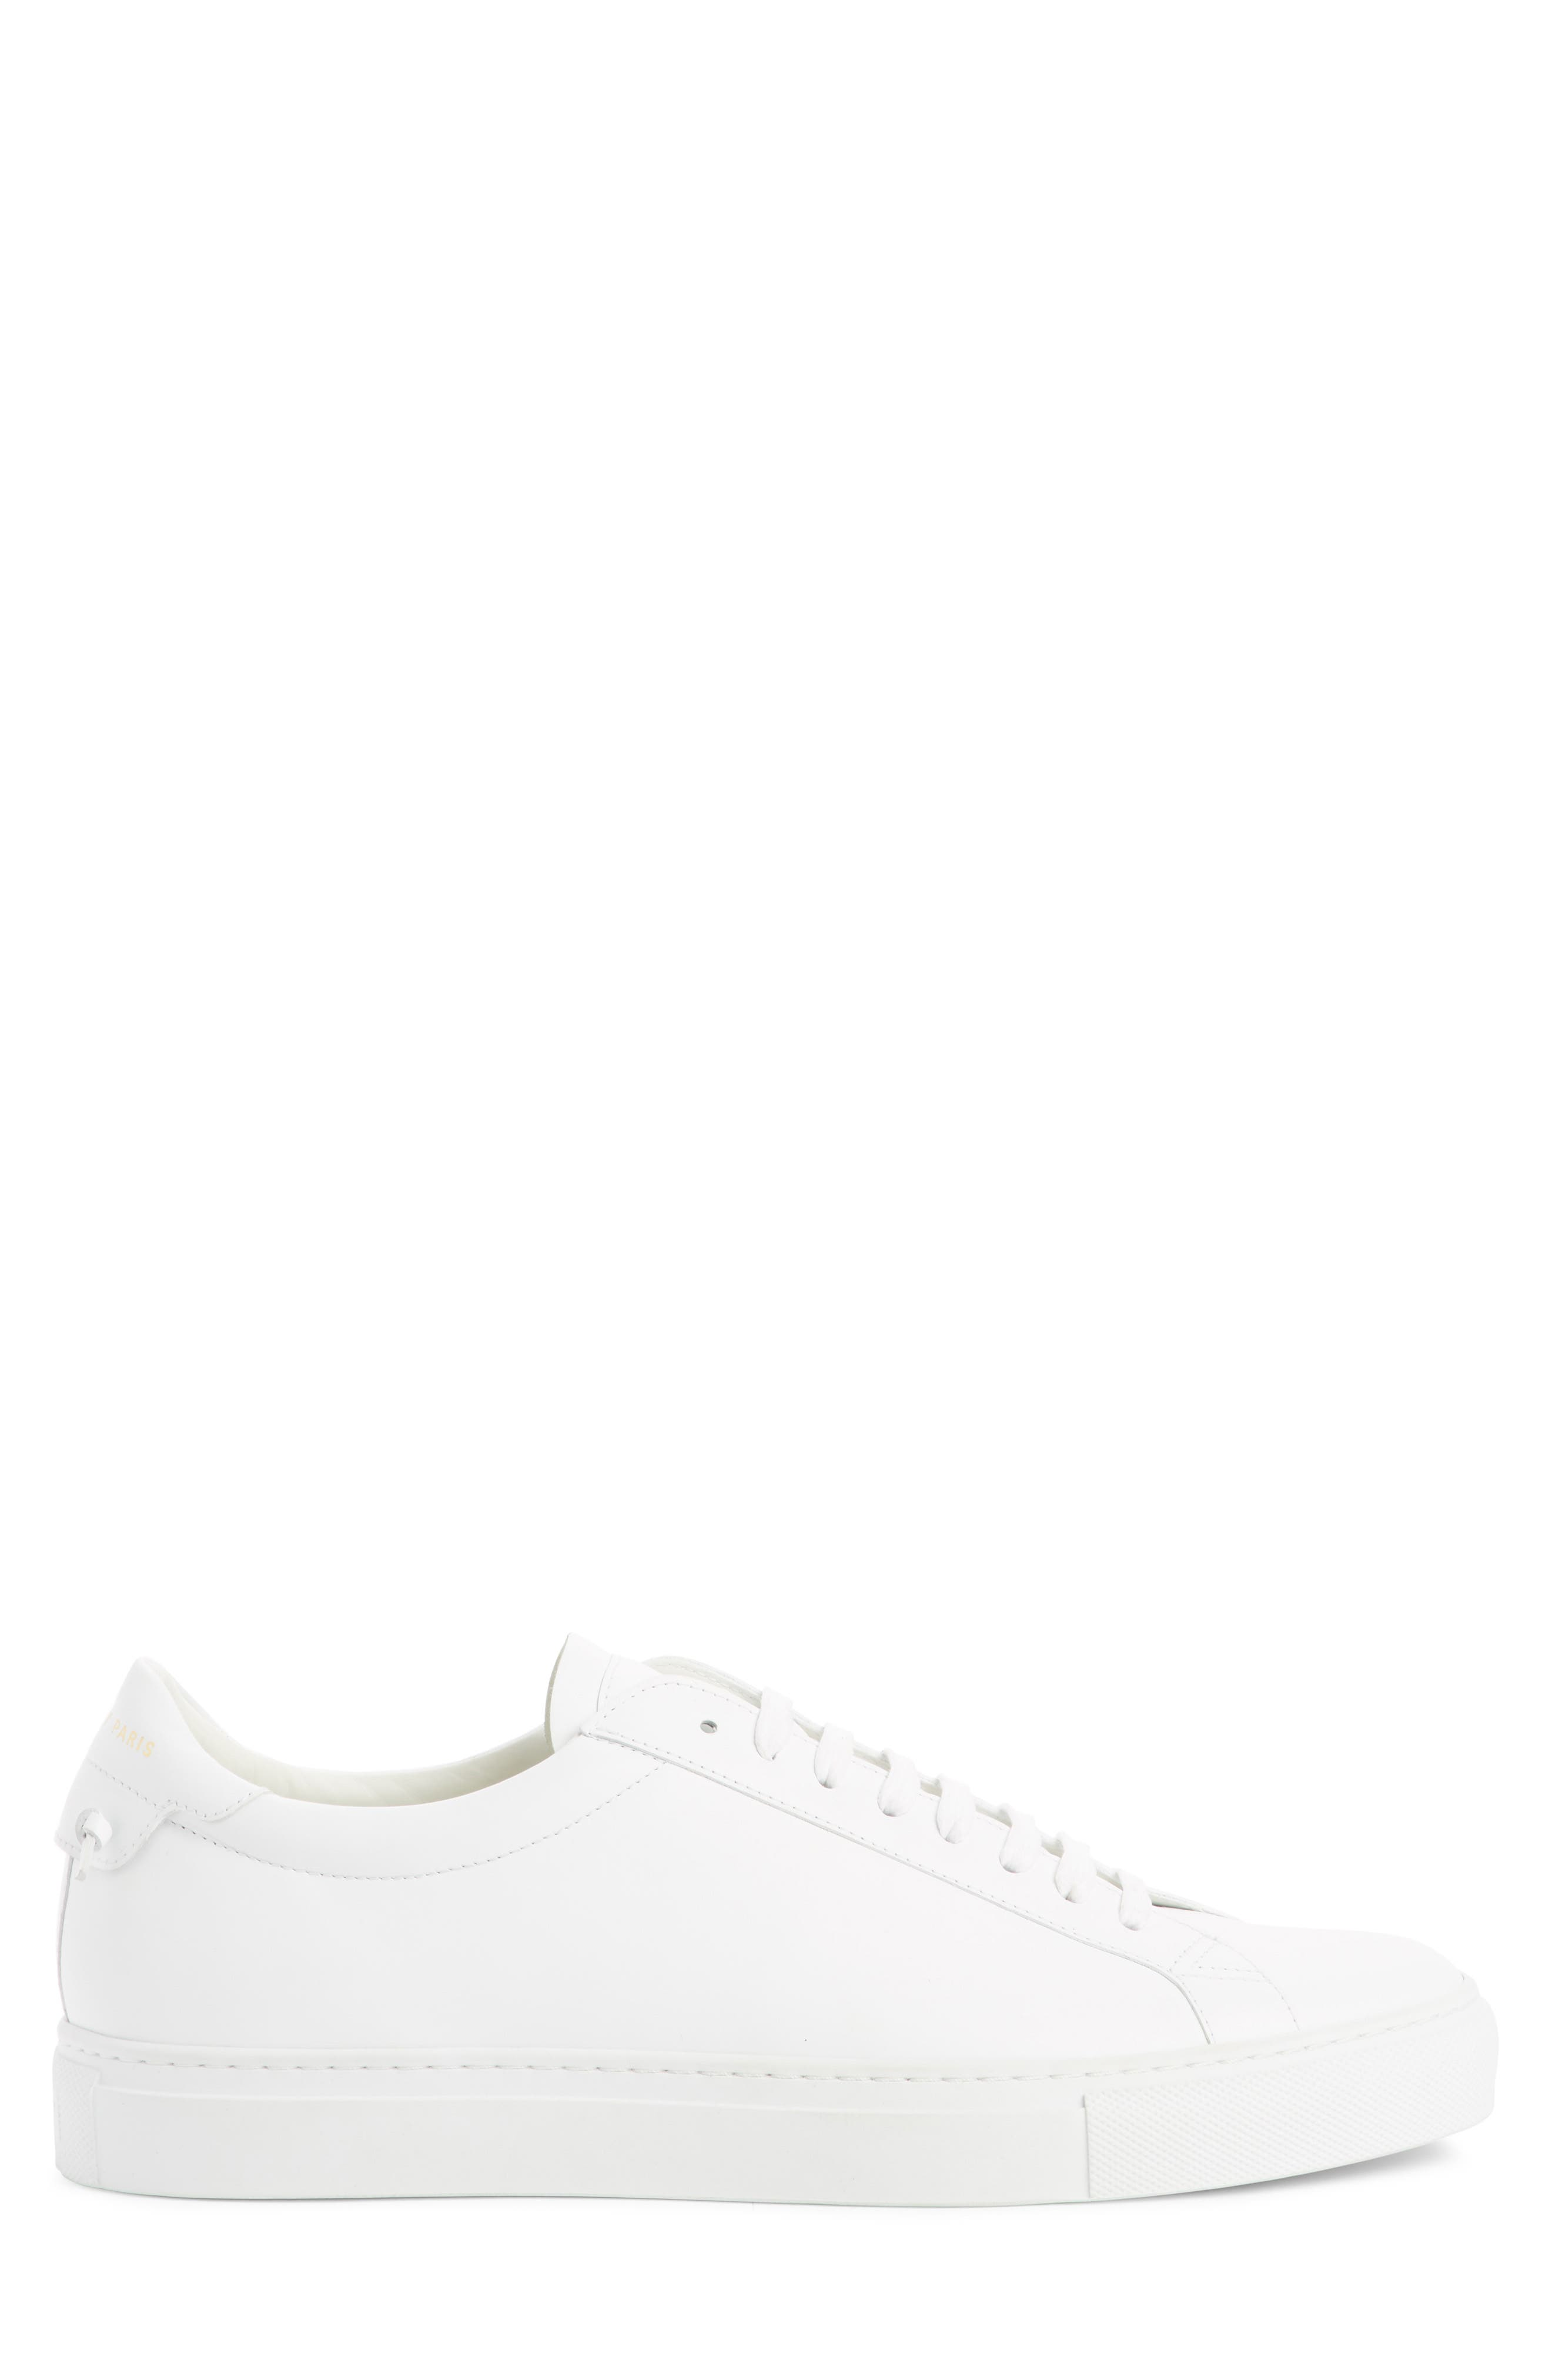 'Urban Knots Lo' Sneaker,                             Alternate thumbnail 3, color,                             WHITE/ WHITE